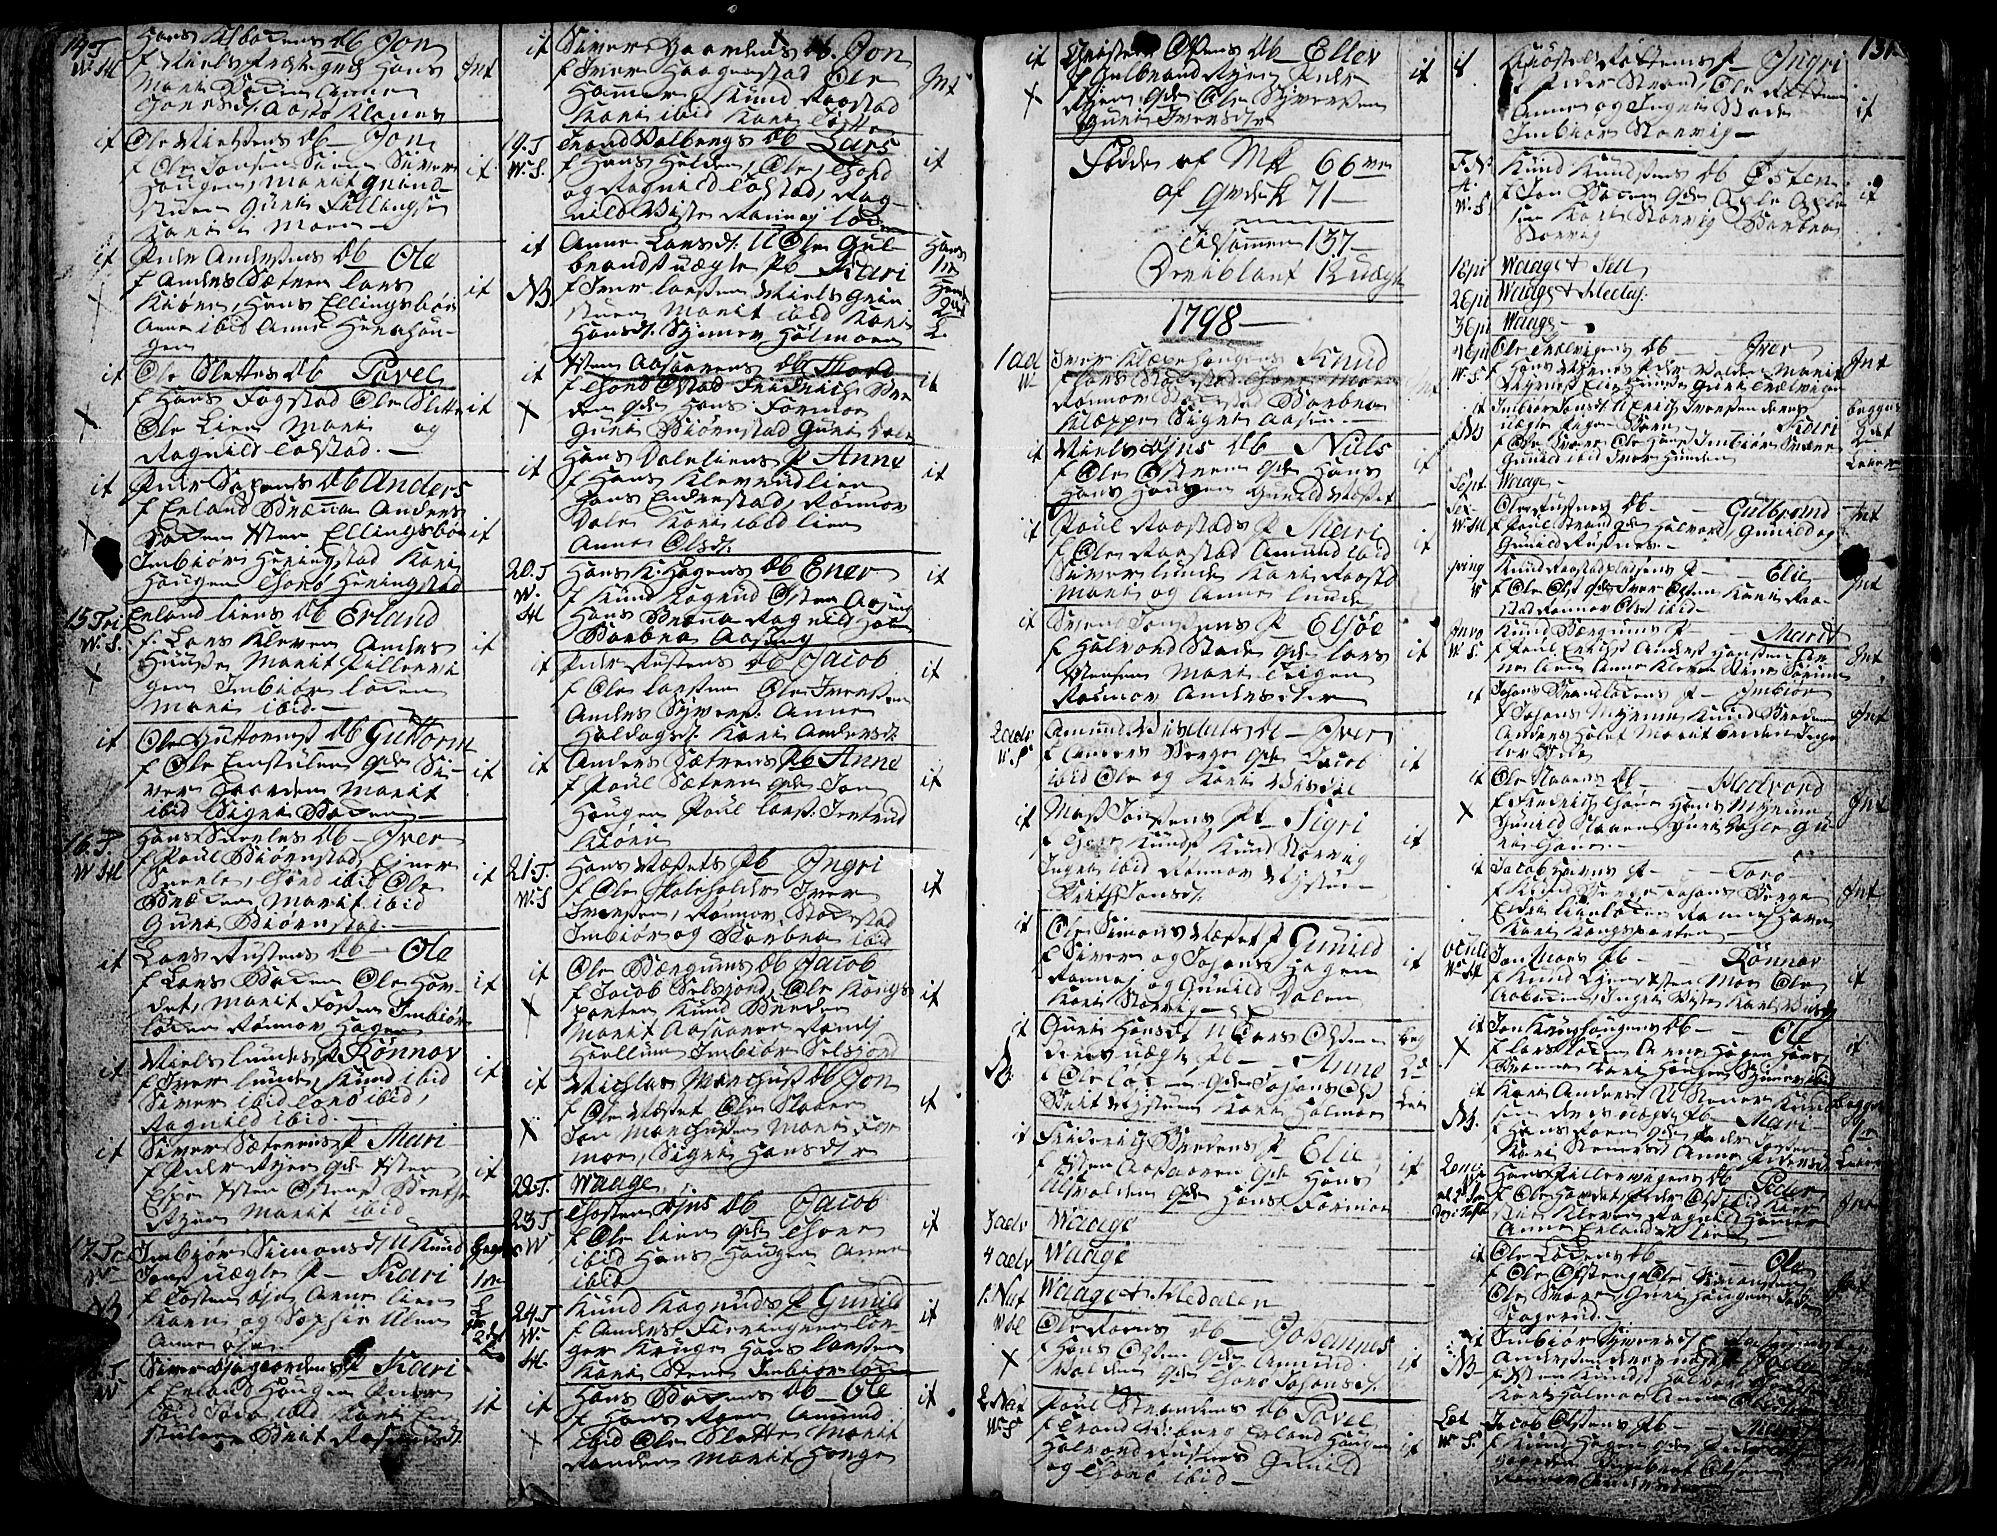 SAH, Vågå prestekontor, Ministerialbok nr. 1, 1739-1810, s. 131